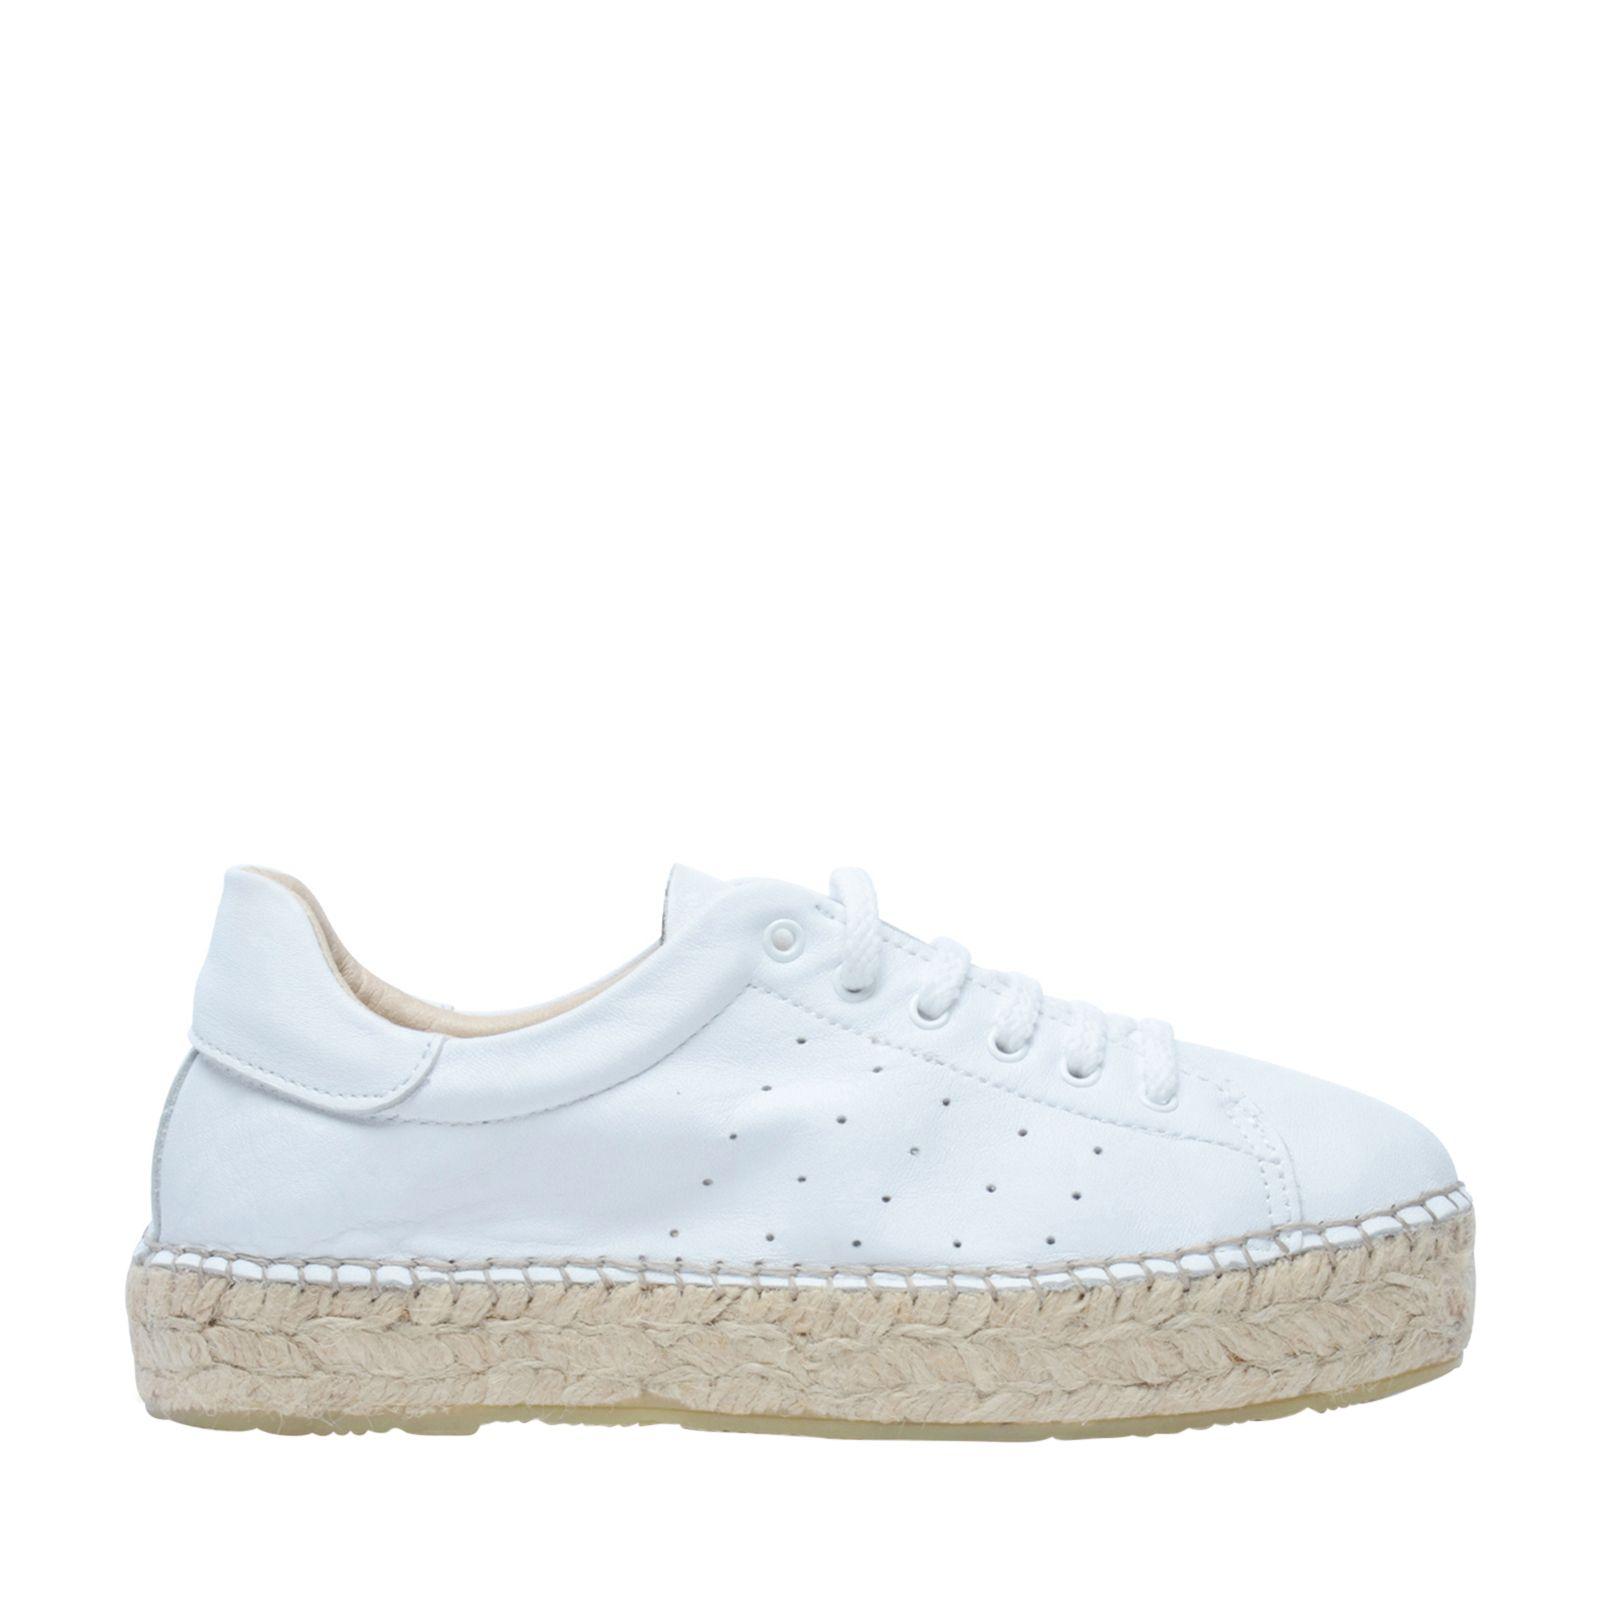 f94715f36e8 Witte lage sneakers met touwzool - Damesschoenen – SACHA